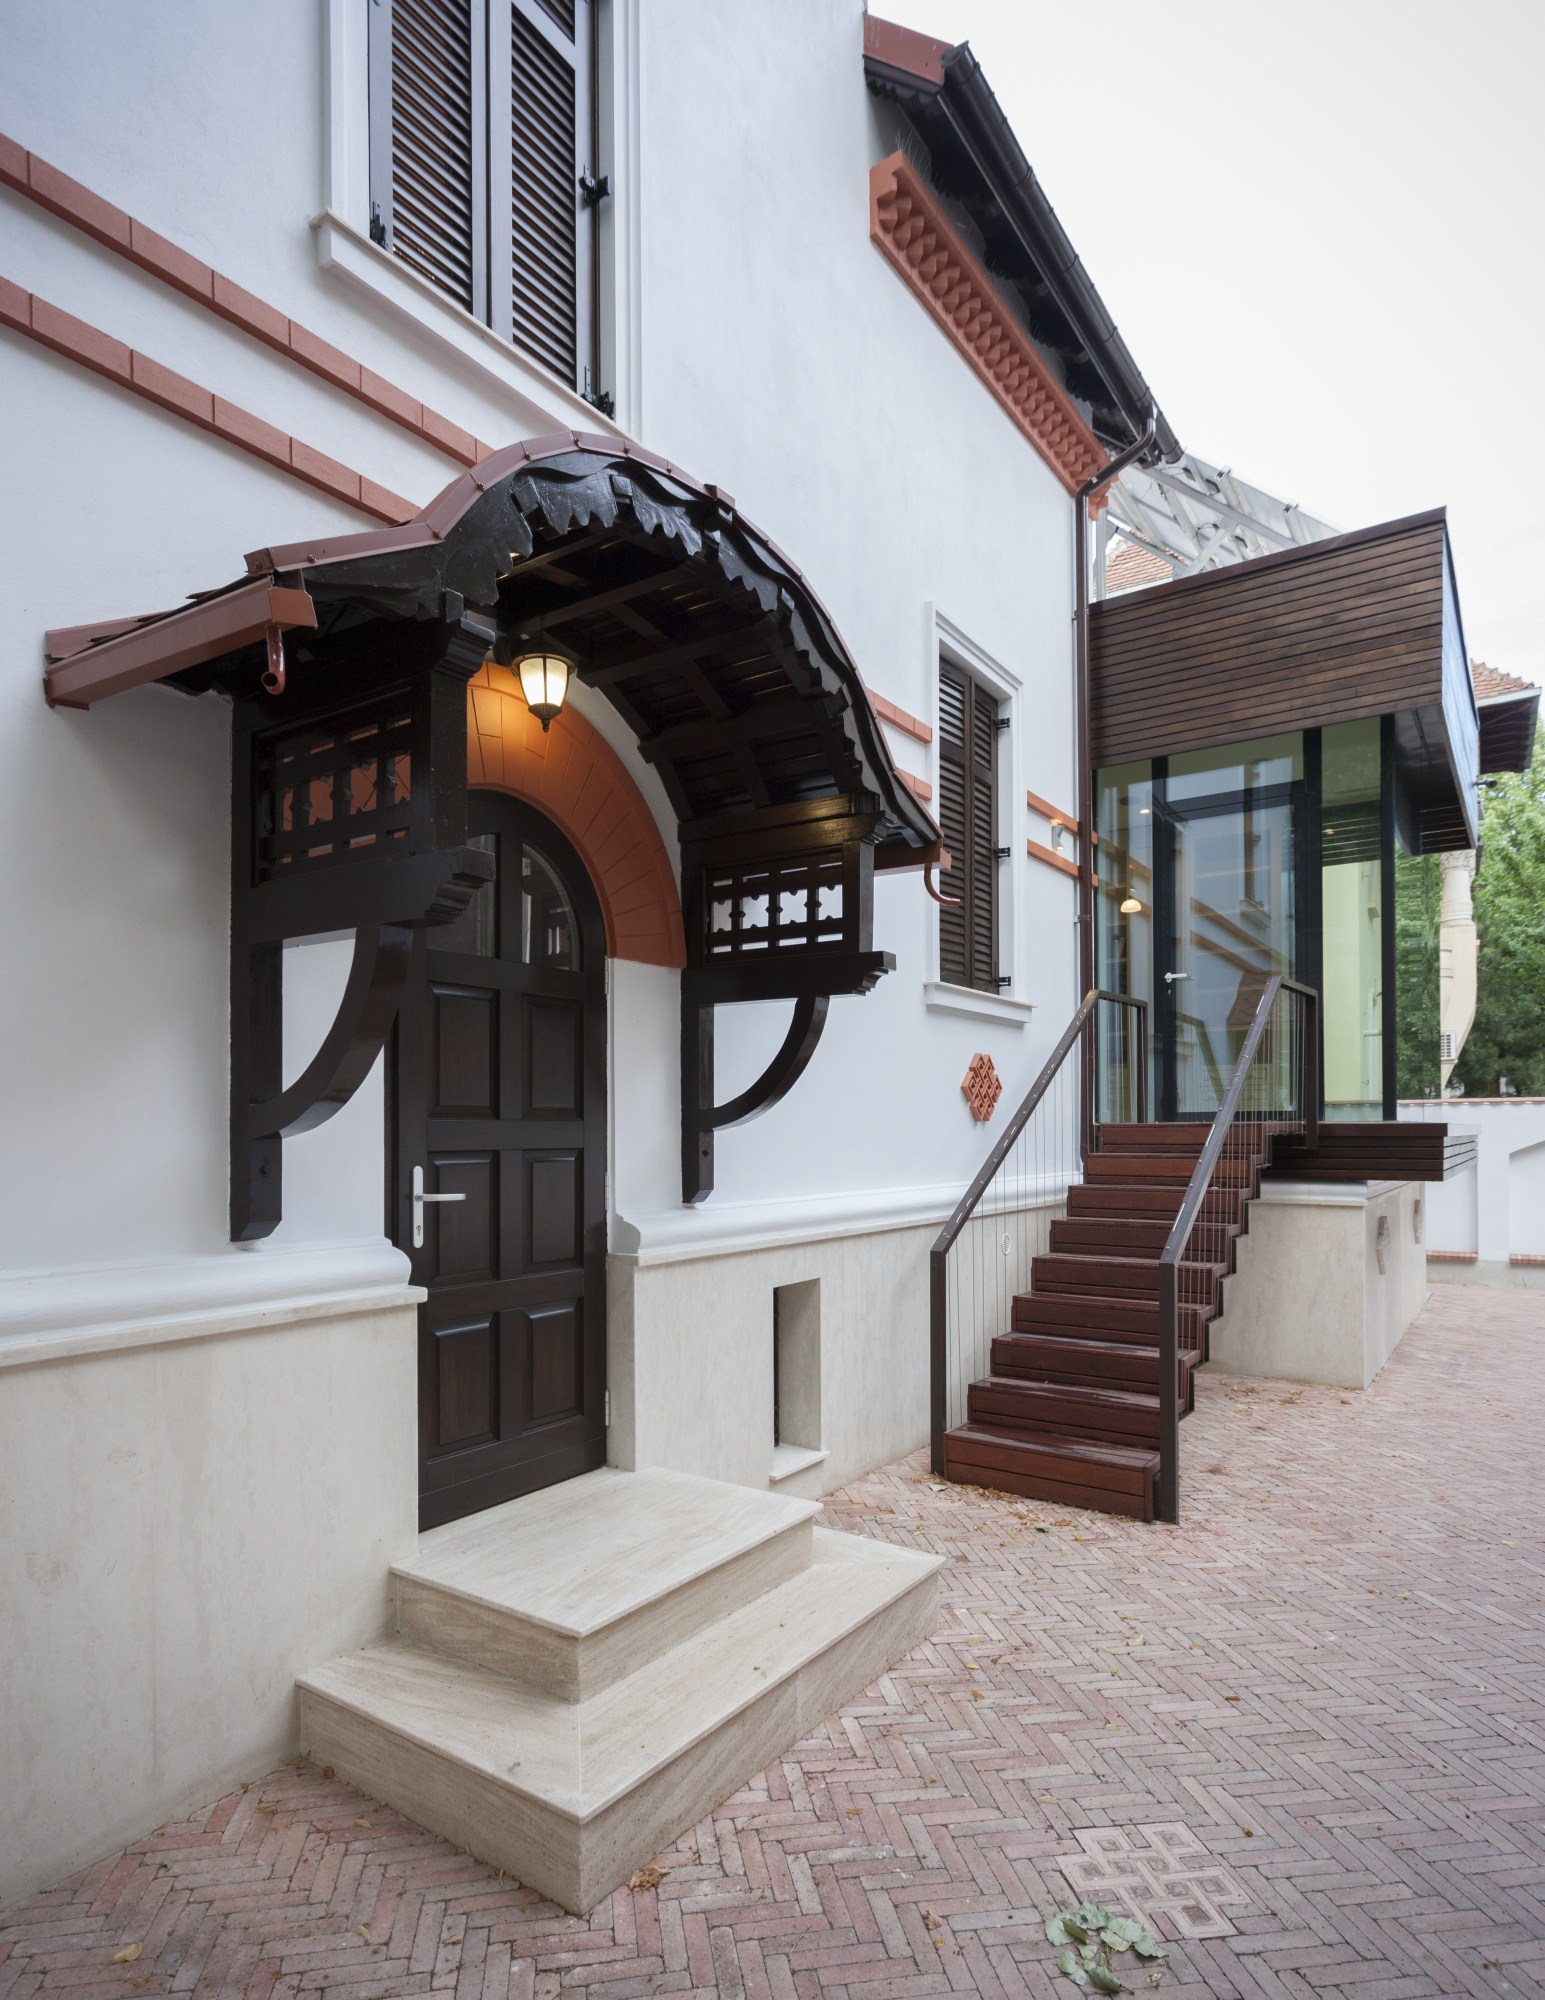 https://nbc-arhitect.ro/wp-content/uploads/2020/10/NBC-Arhitect-_-restorations-_-Washington-House-_-Bucharest-Romania_52.jpg